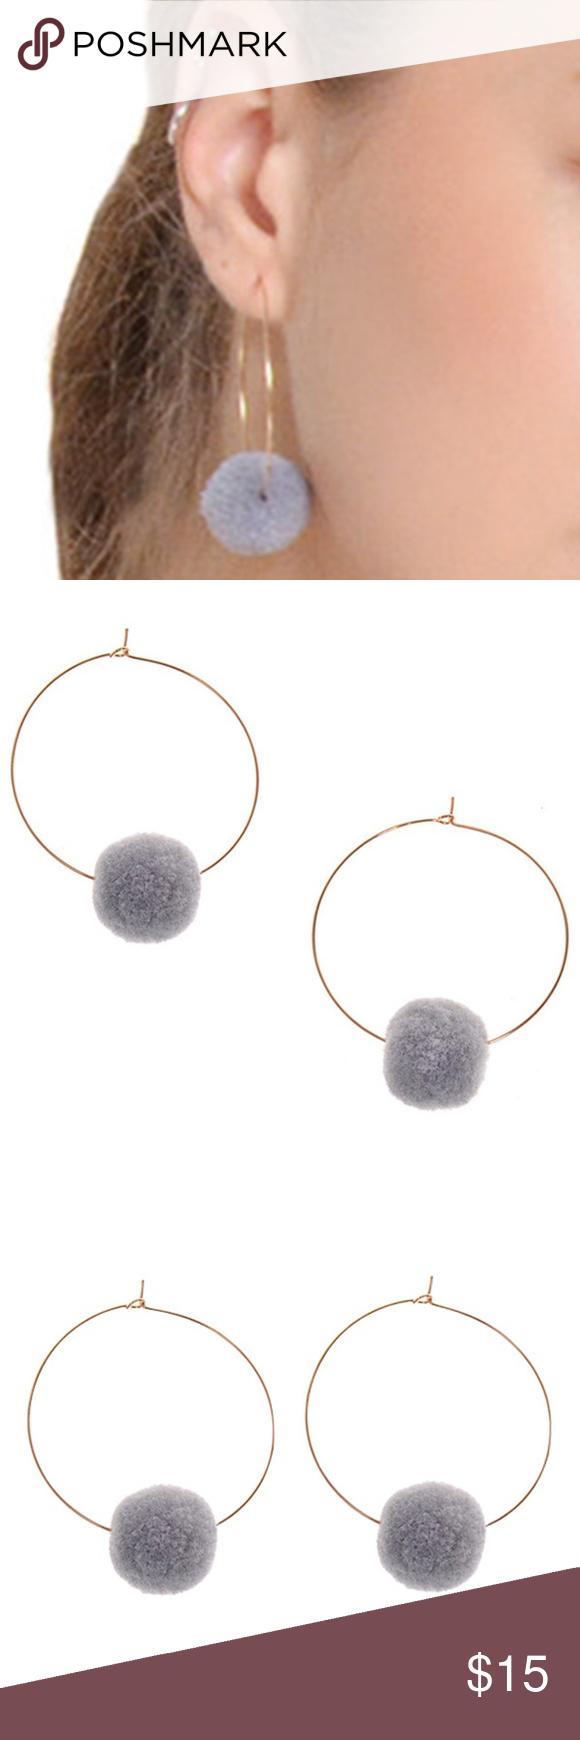 Fuzzy Ball Round Hoop Earrings Gray Boutique Hoop